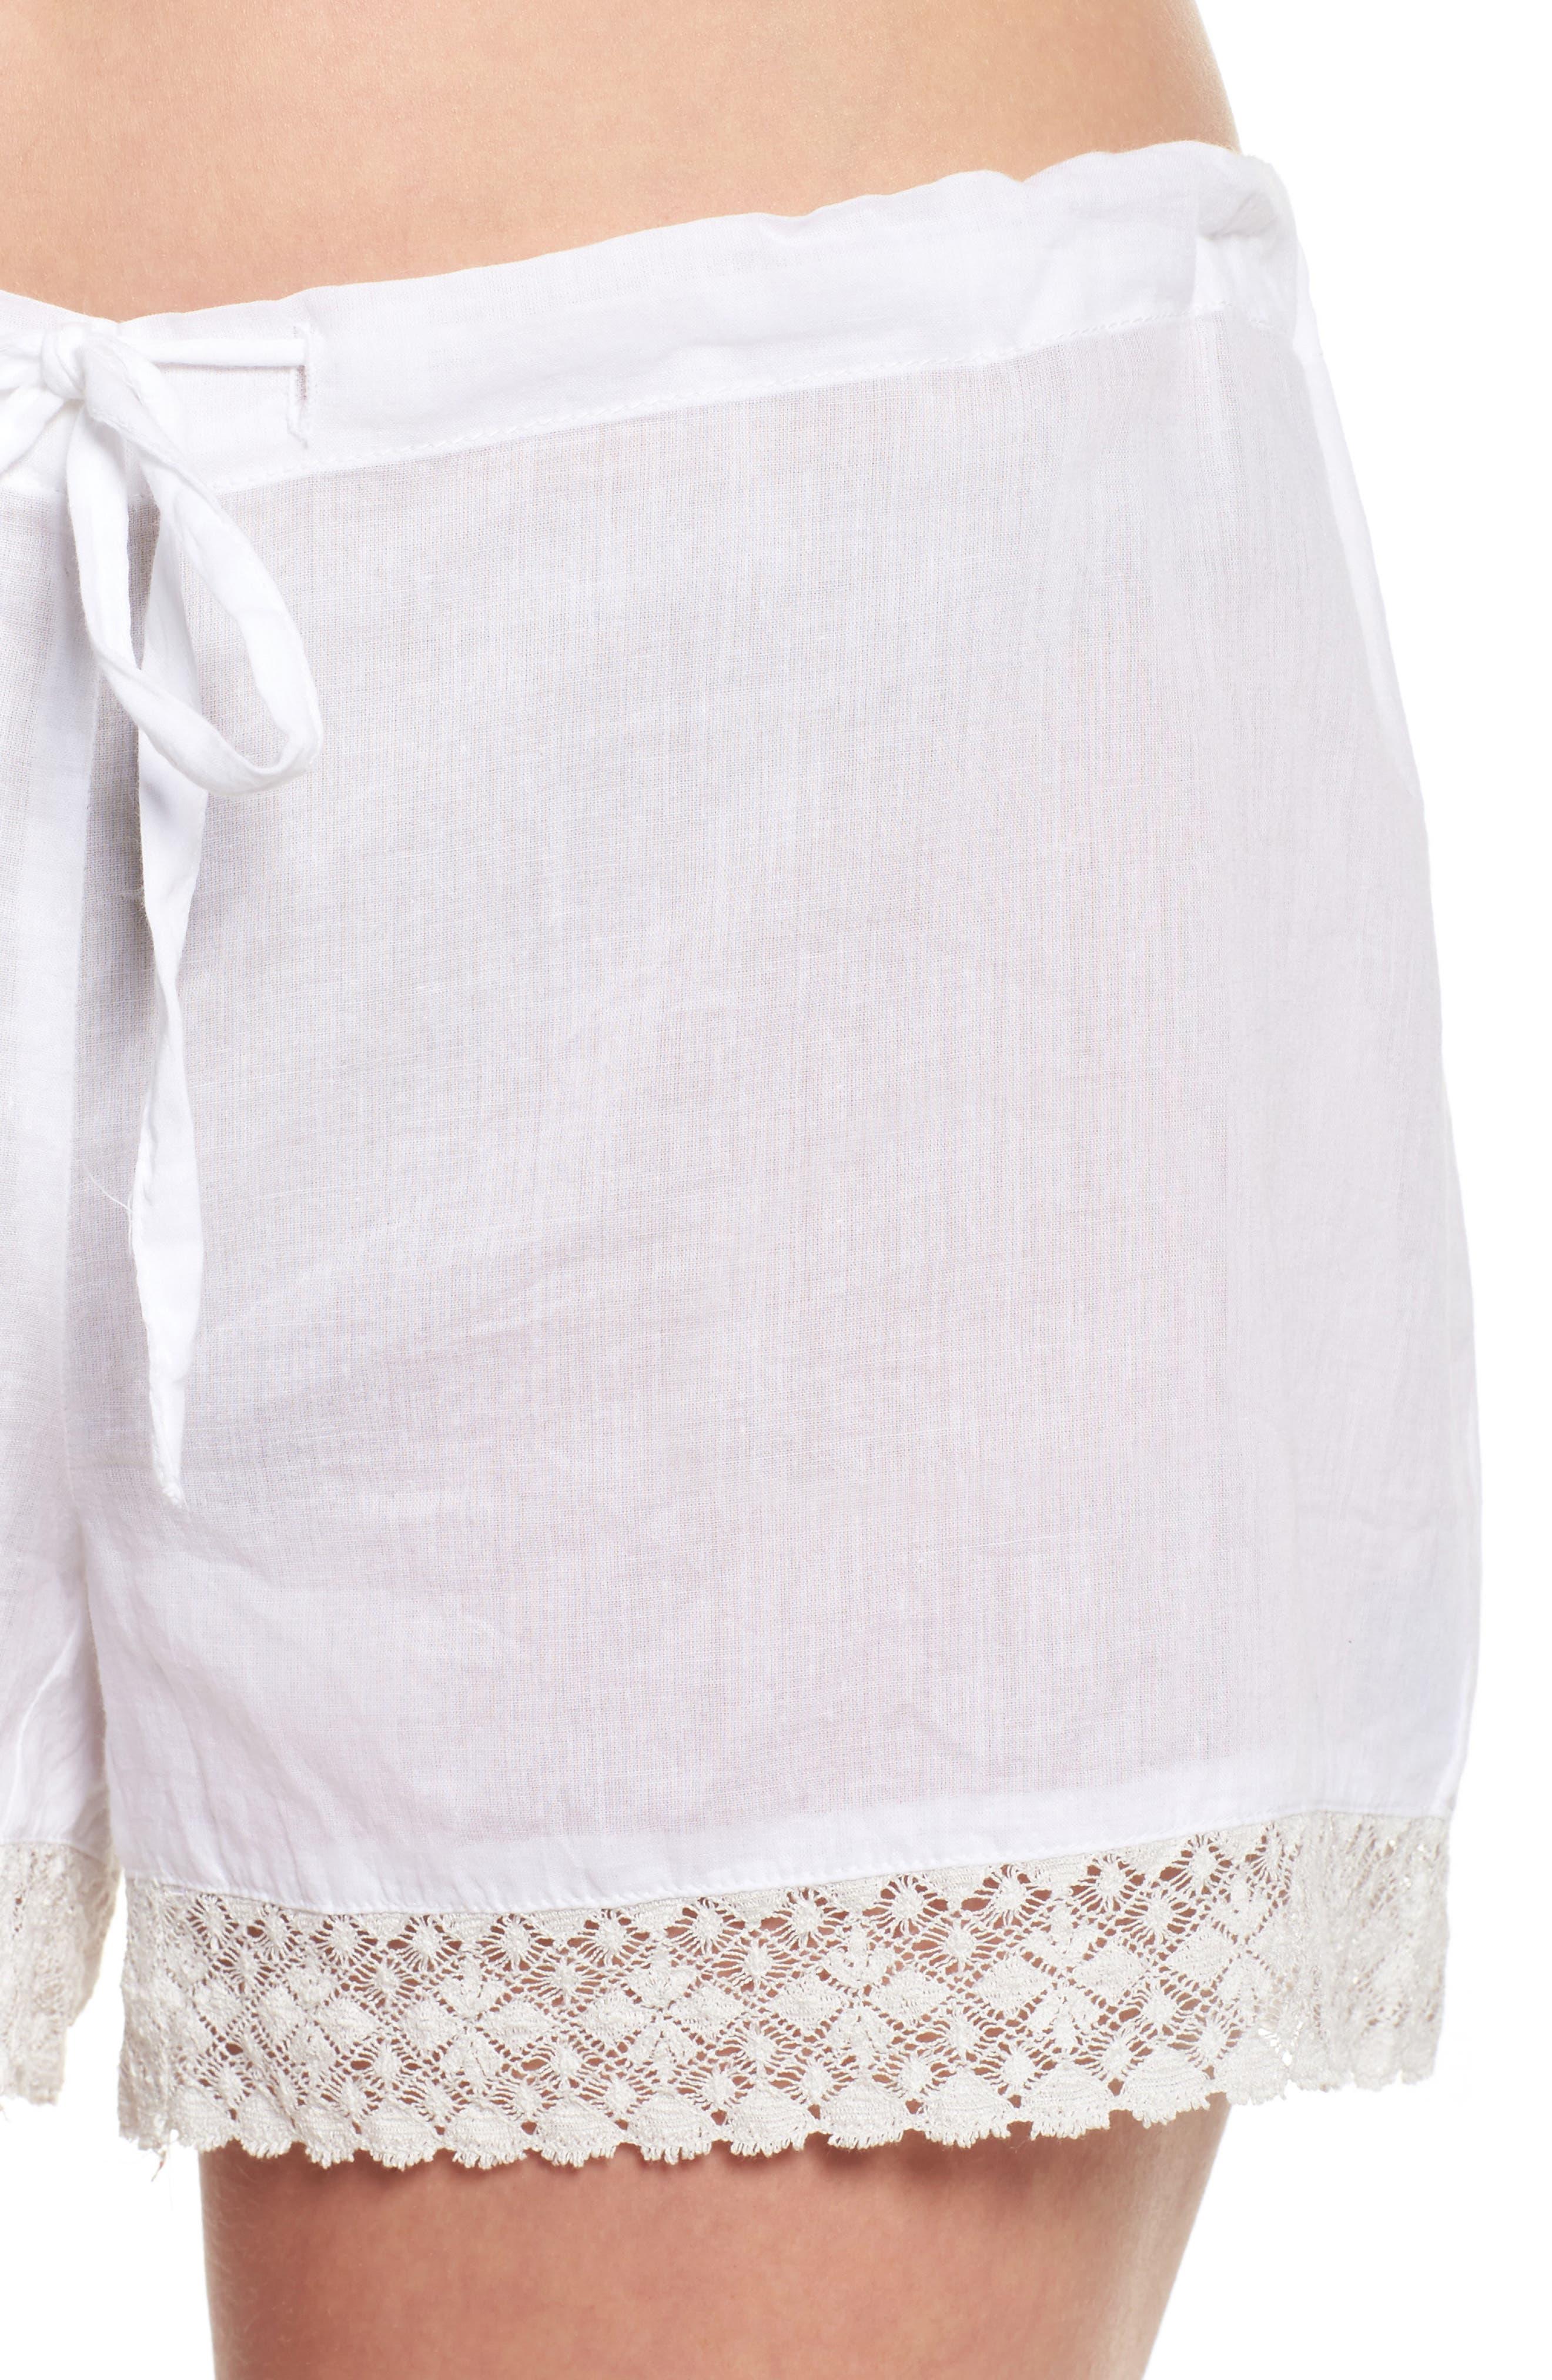 Lace Trim Sleep Shorts,                             Alternate thumbnail 6, color,                             White